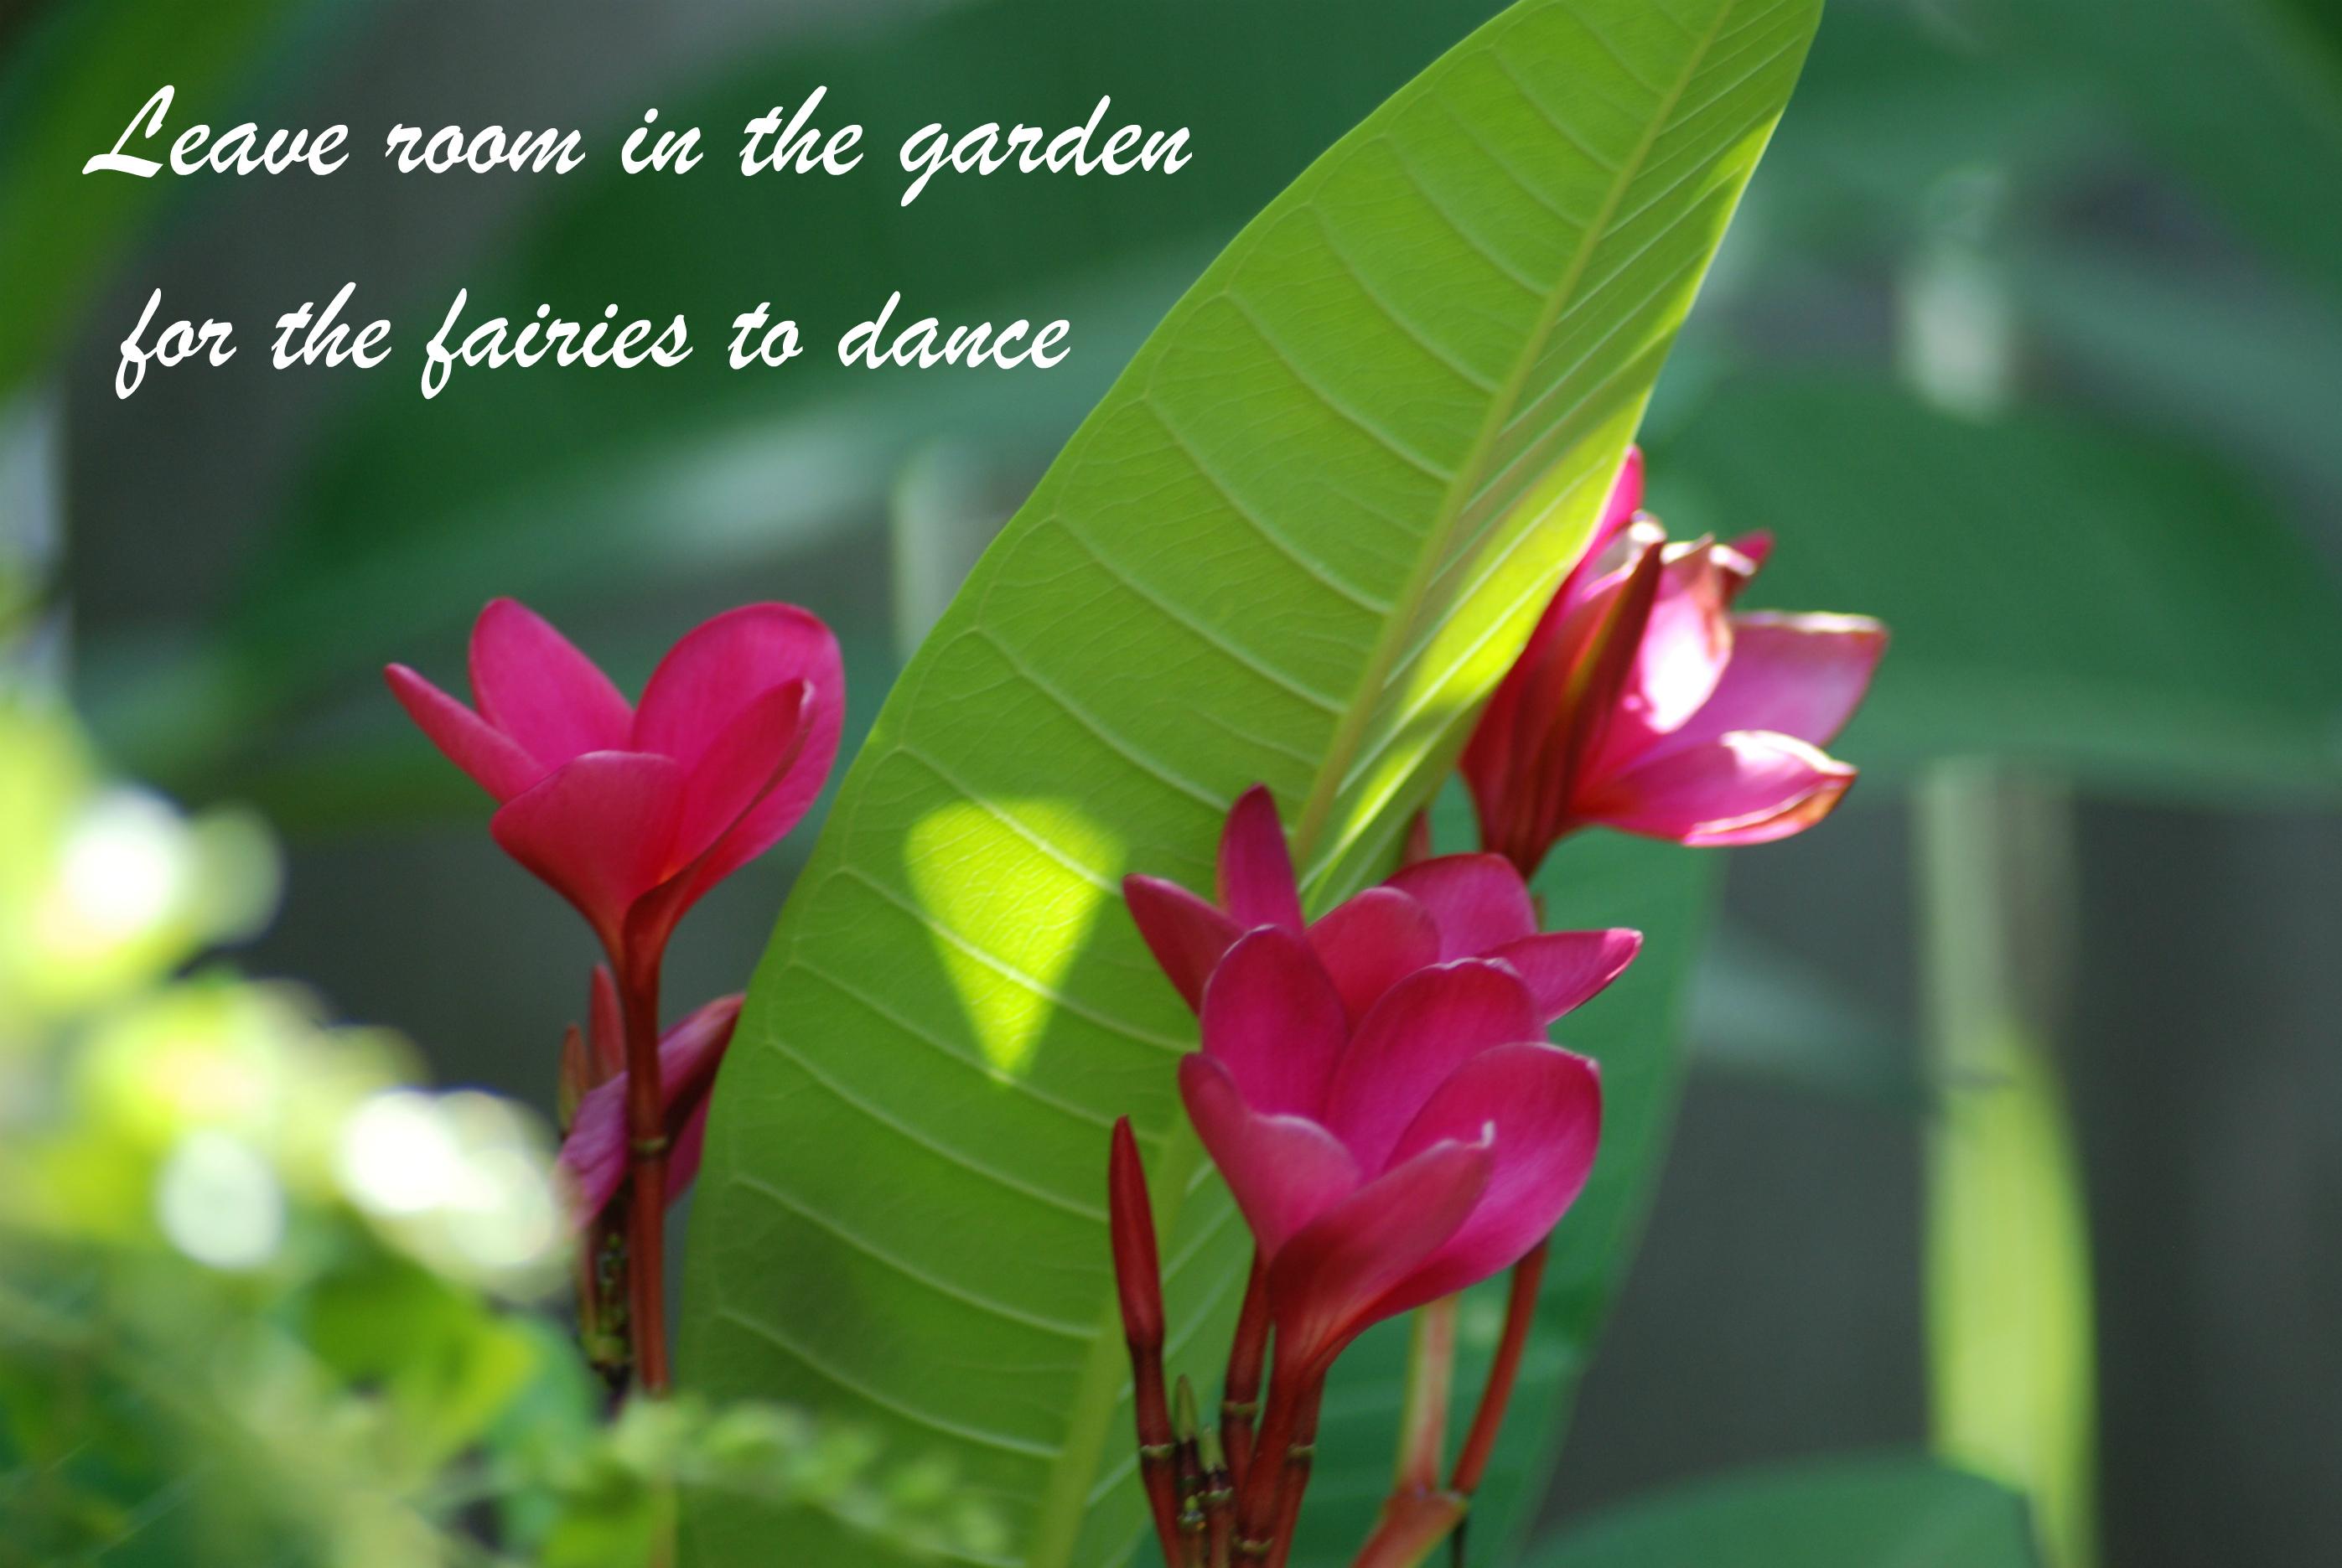 Fairies to Dance